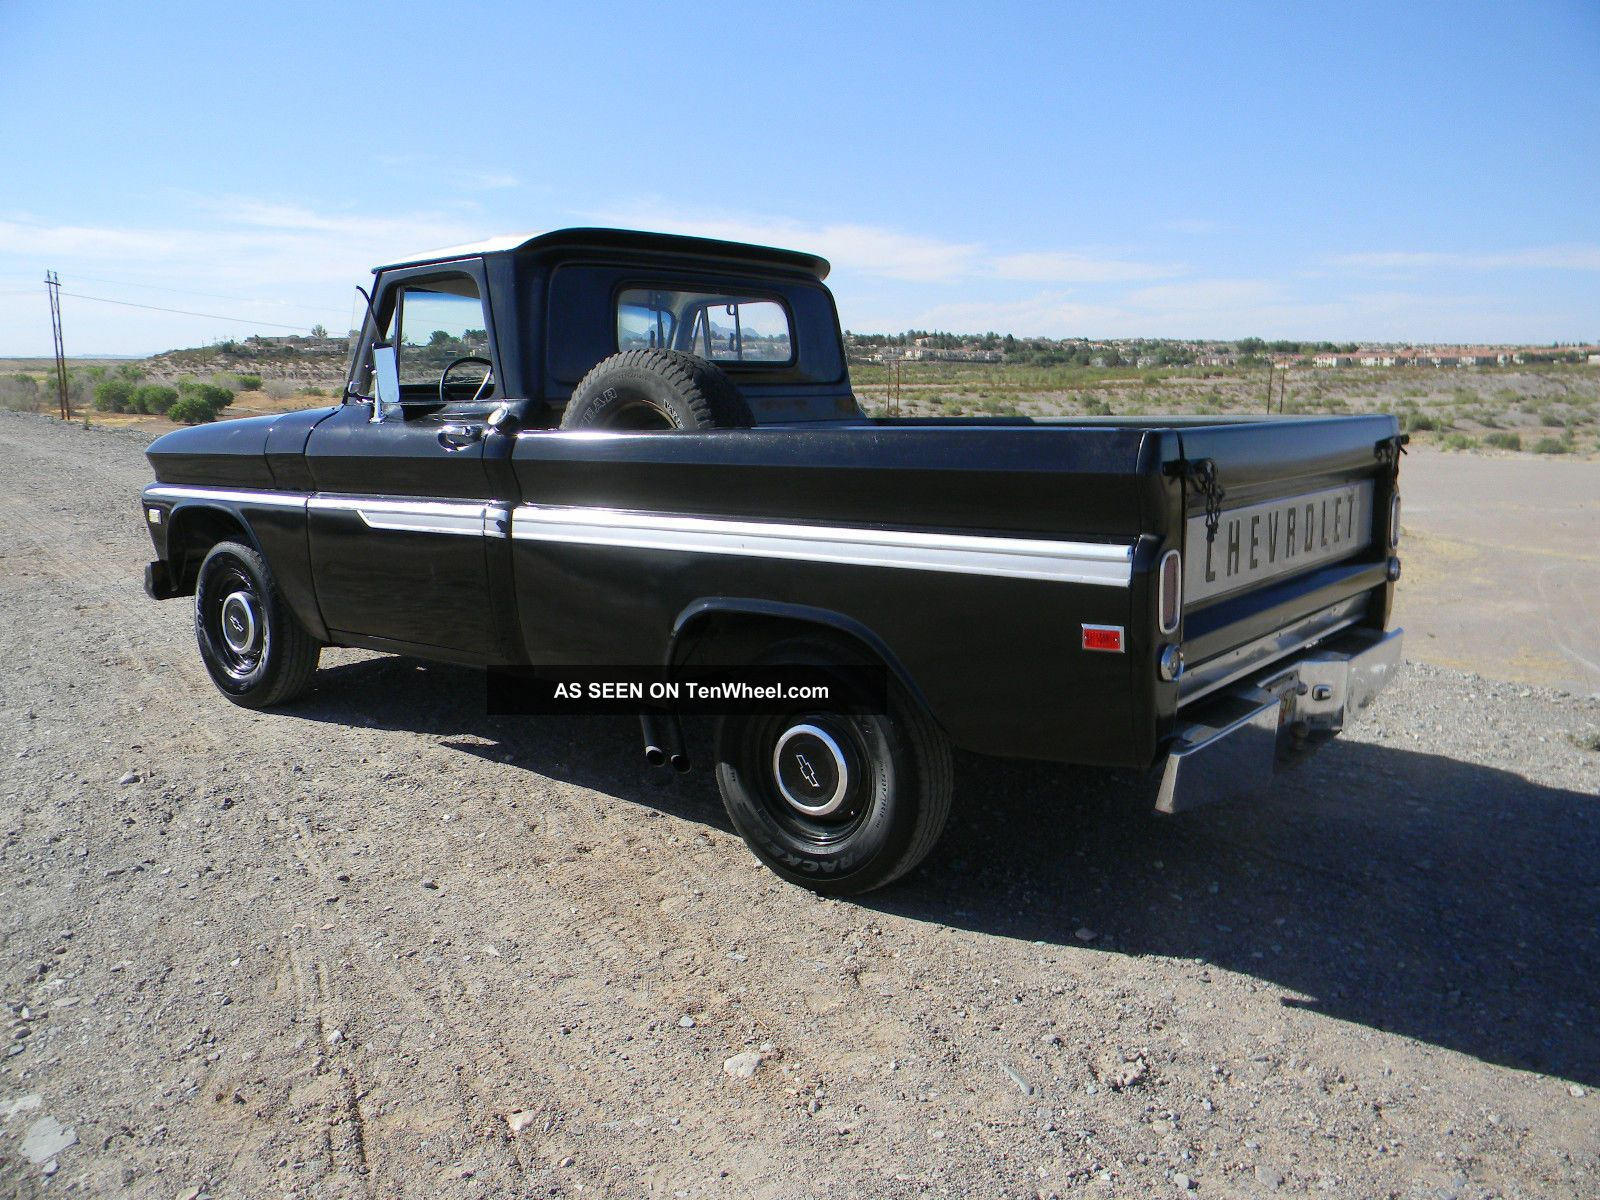 1966 Chevy C10 Truck Short Bed C14 V8 66 65 64 67 Hot Rod Rat Rod Shortbed  C - 10